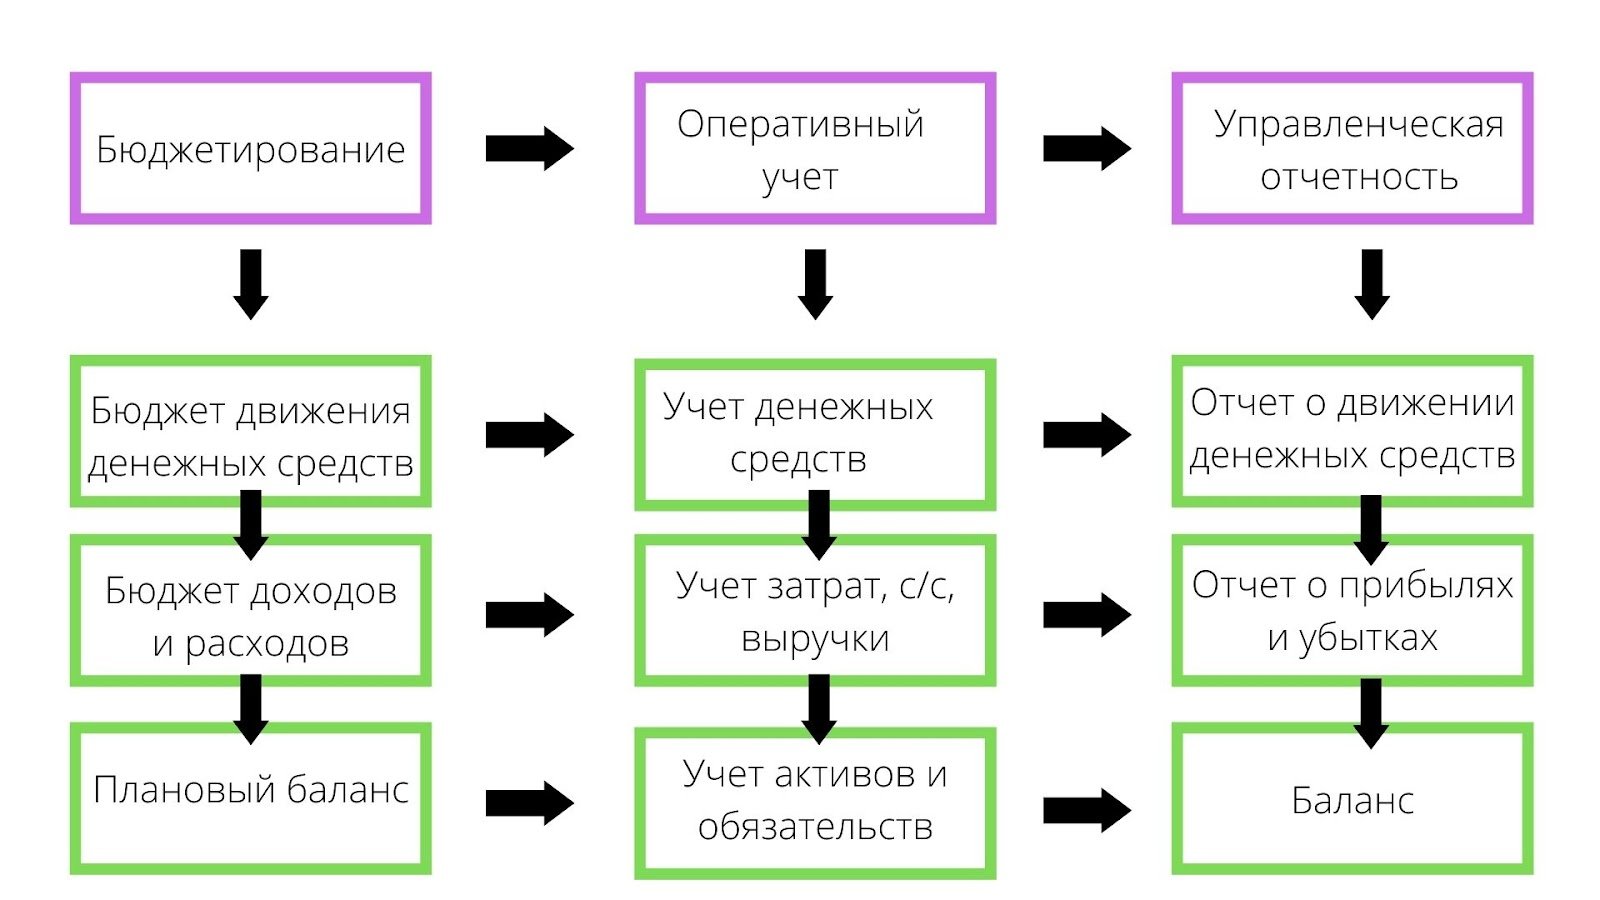 показатели управленческого учета предприятия